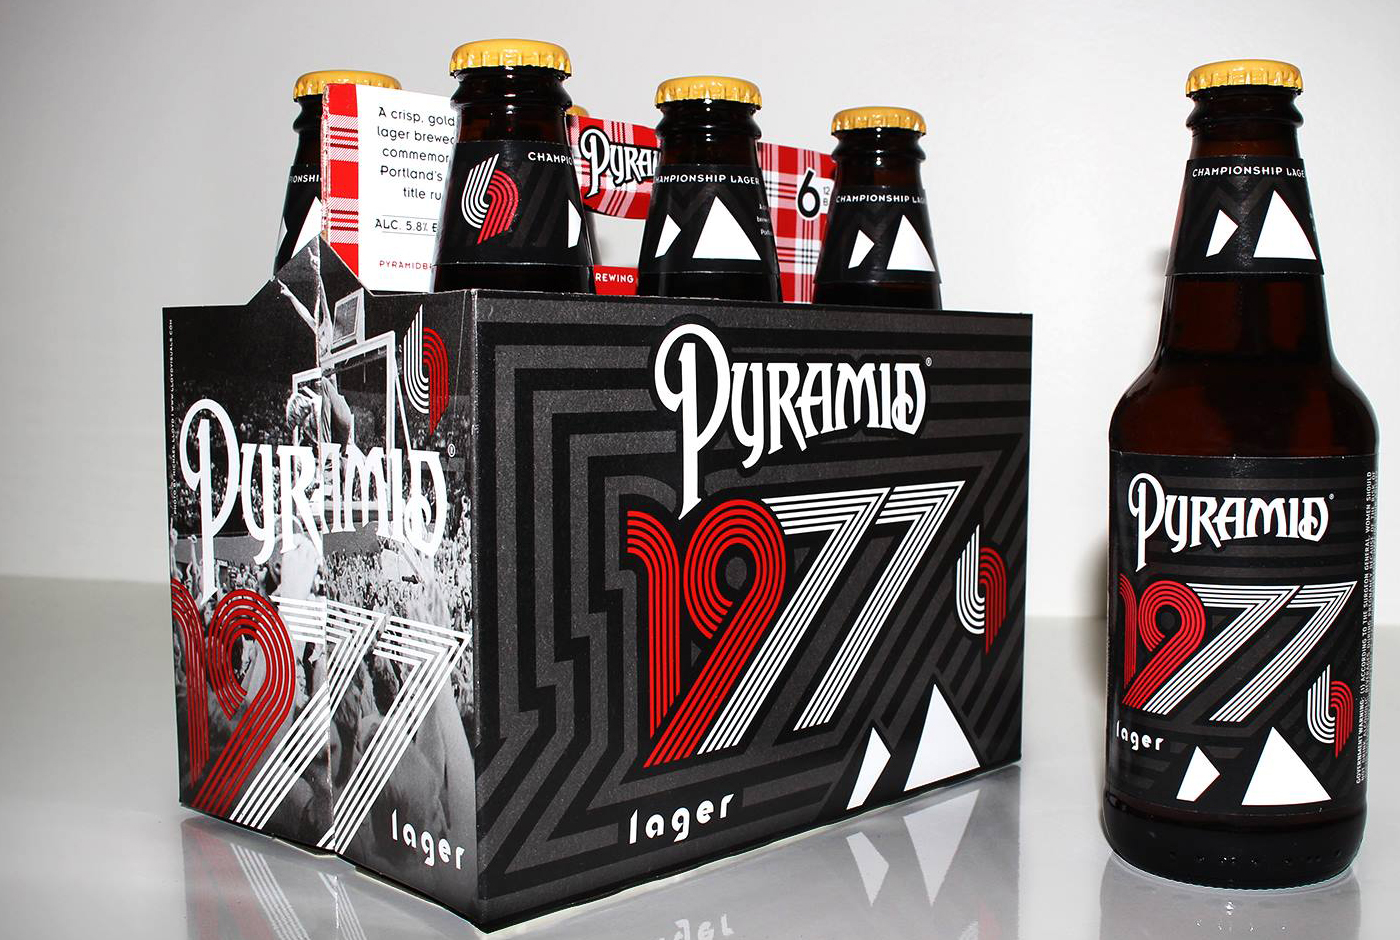 Portland Trail Blazer Lager Death Hoppy Black Ale And Megadeth S A Tout Le Monde Peaks And Pints Proctor Tacomapeaks And Pints Proctor Tacoma